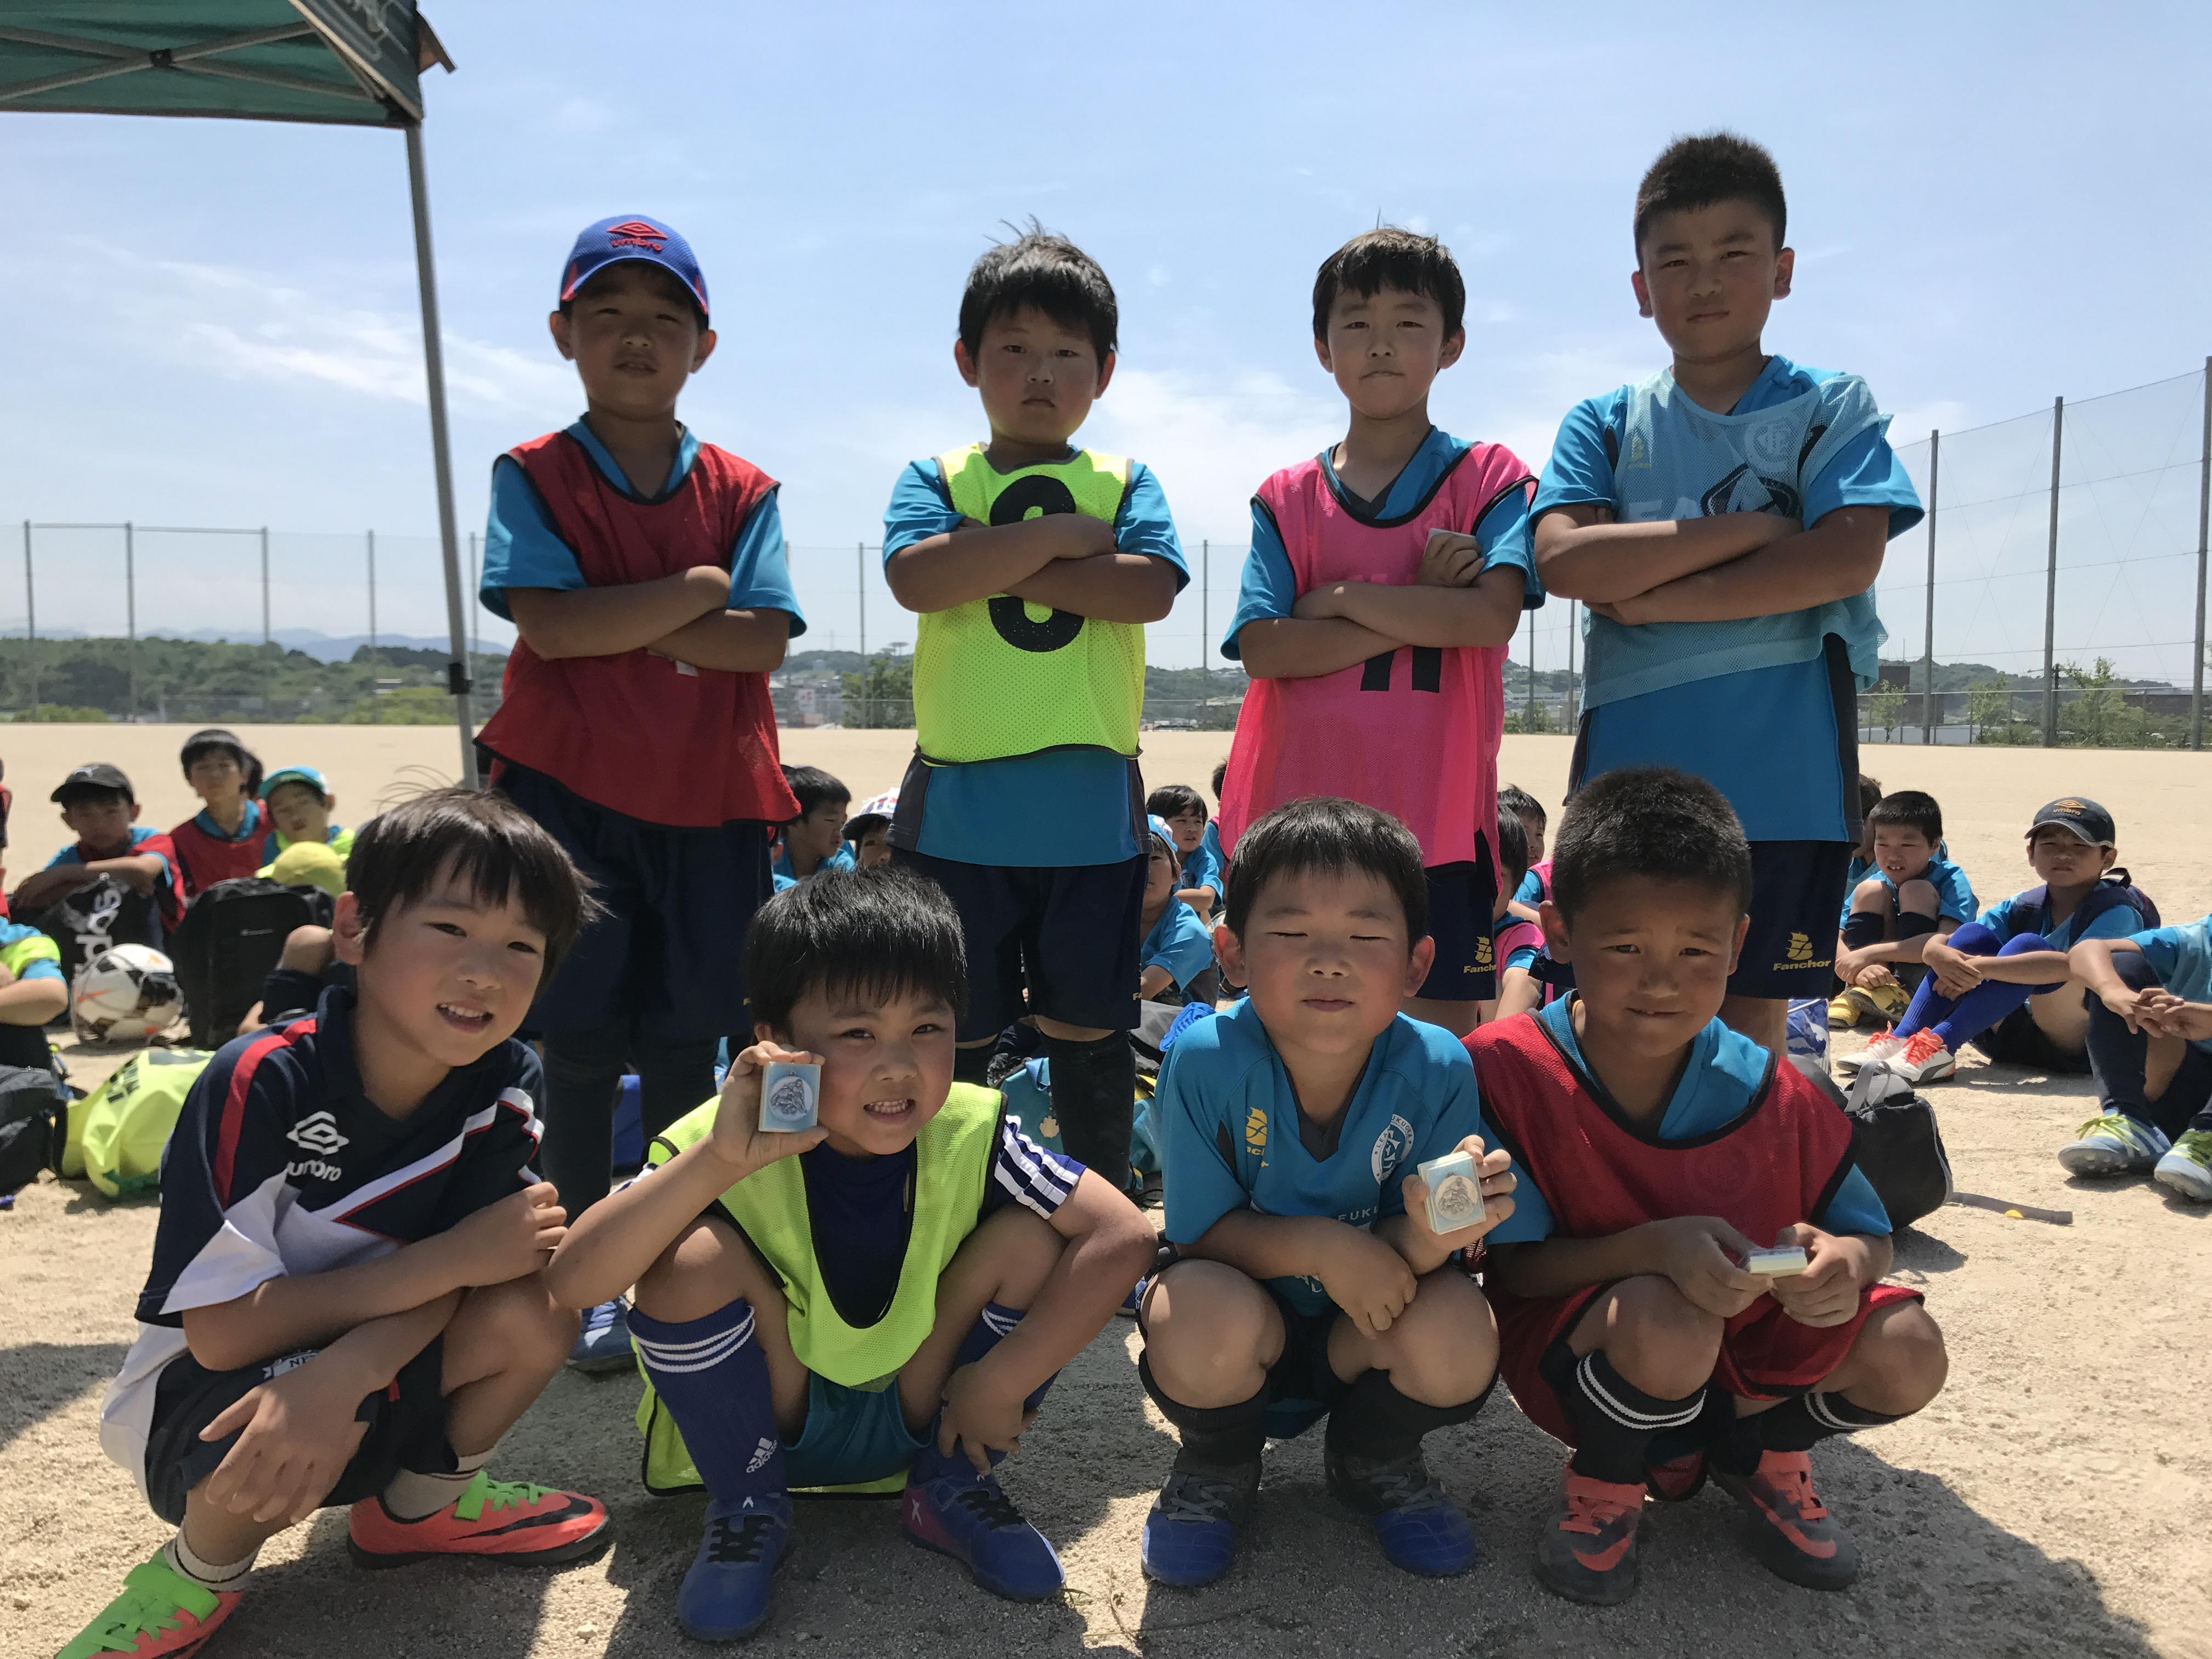 U-11(小学5年生) 年間の大会要項 〜5年生時の公式戦を解説〜